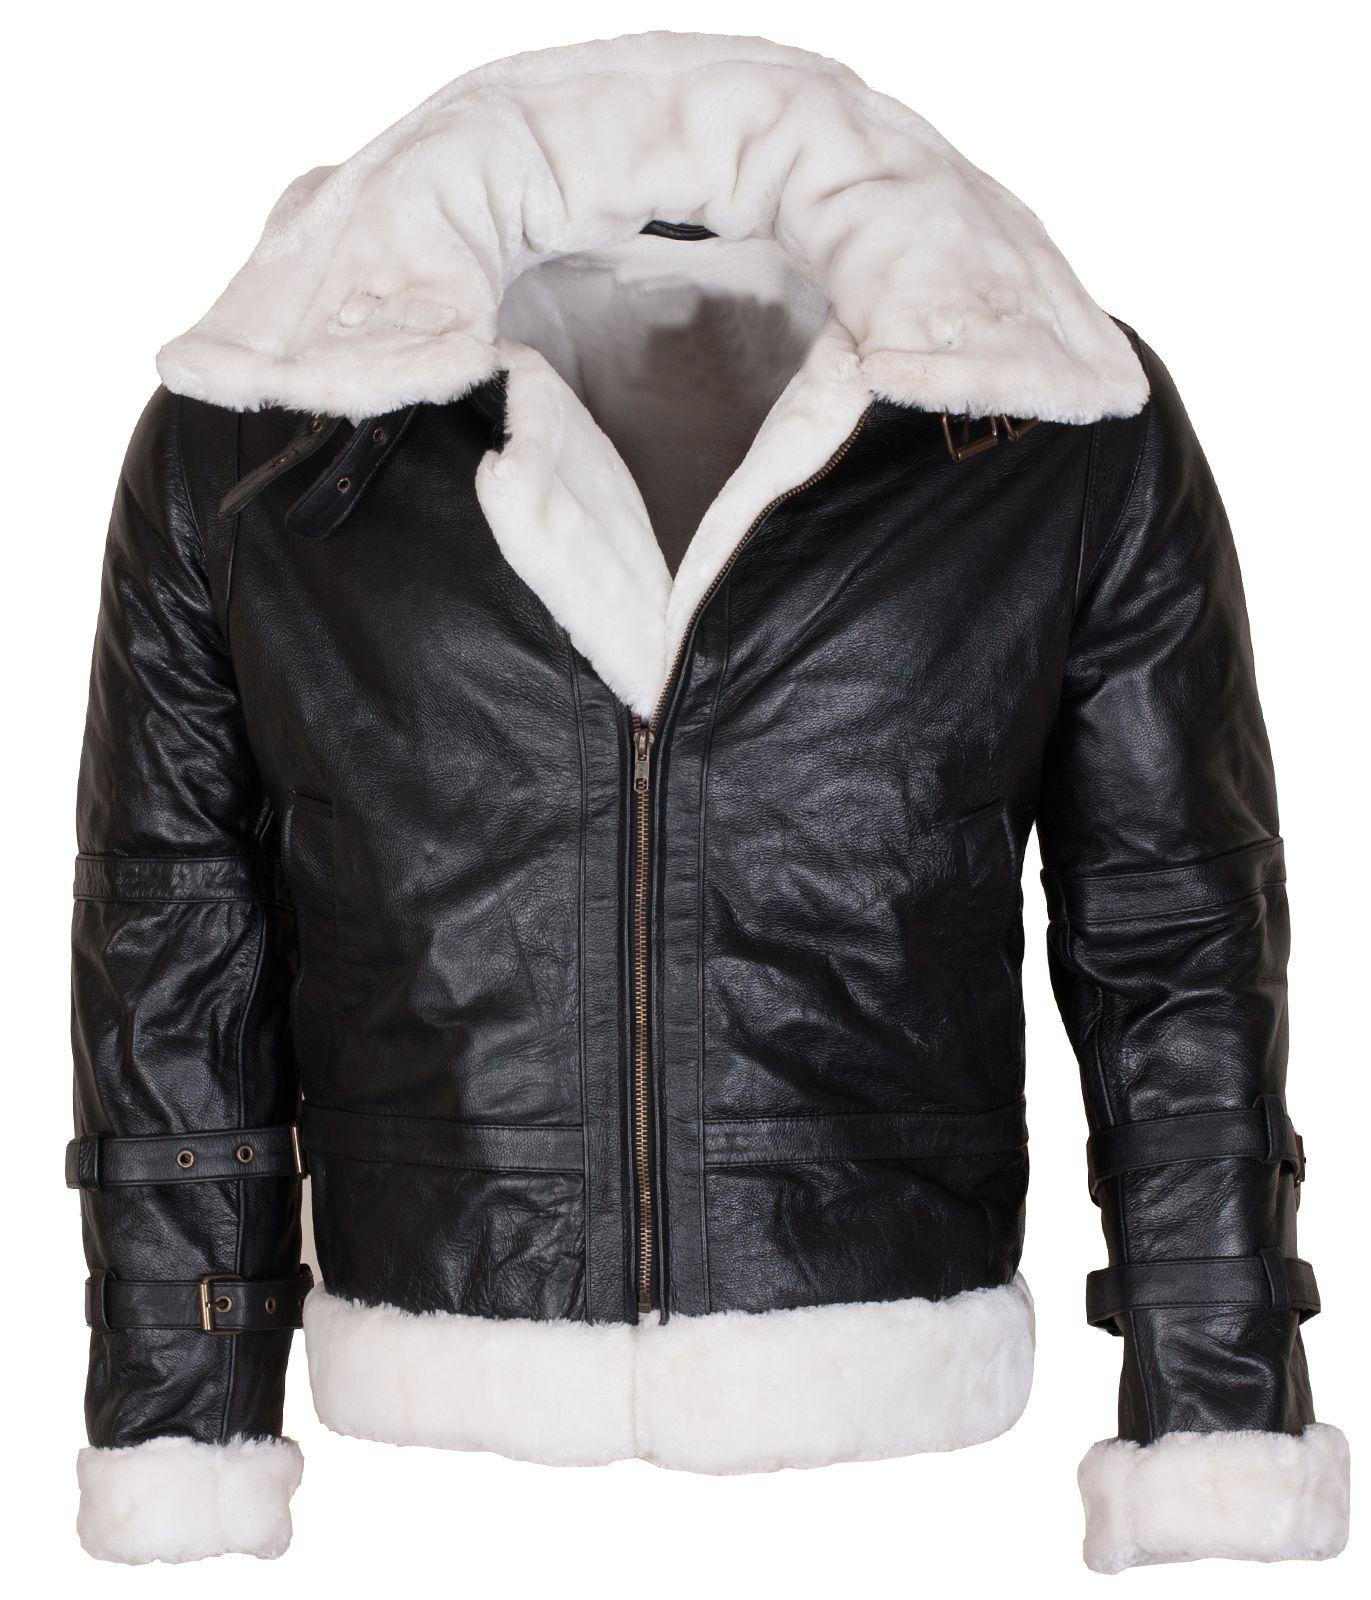 Mens B3 Bomber Winters Fashion Faux FurLining Hooded